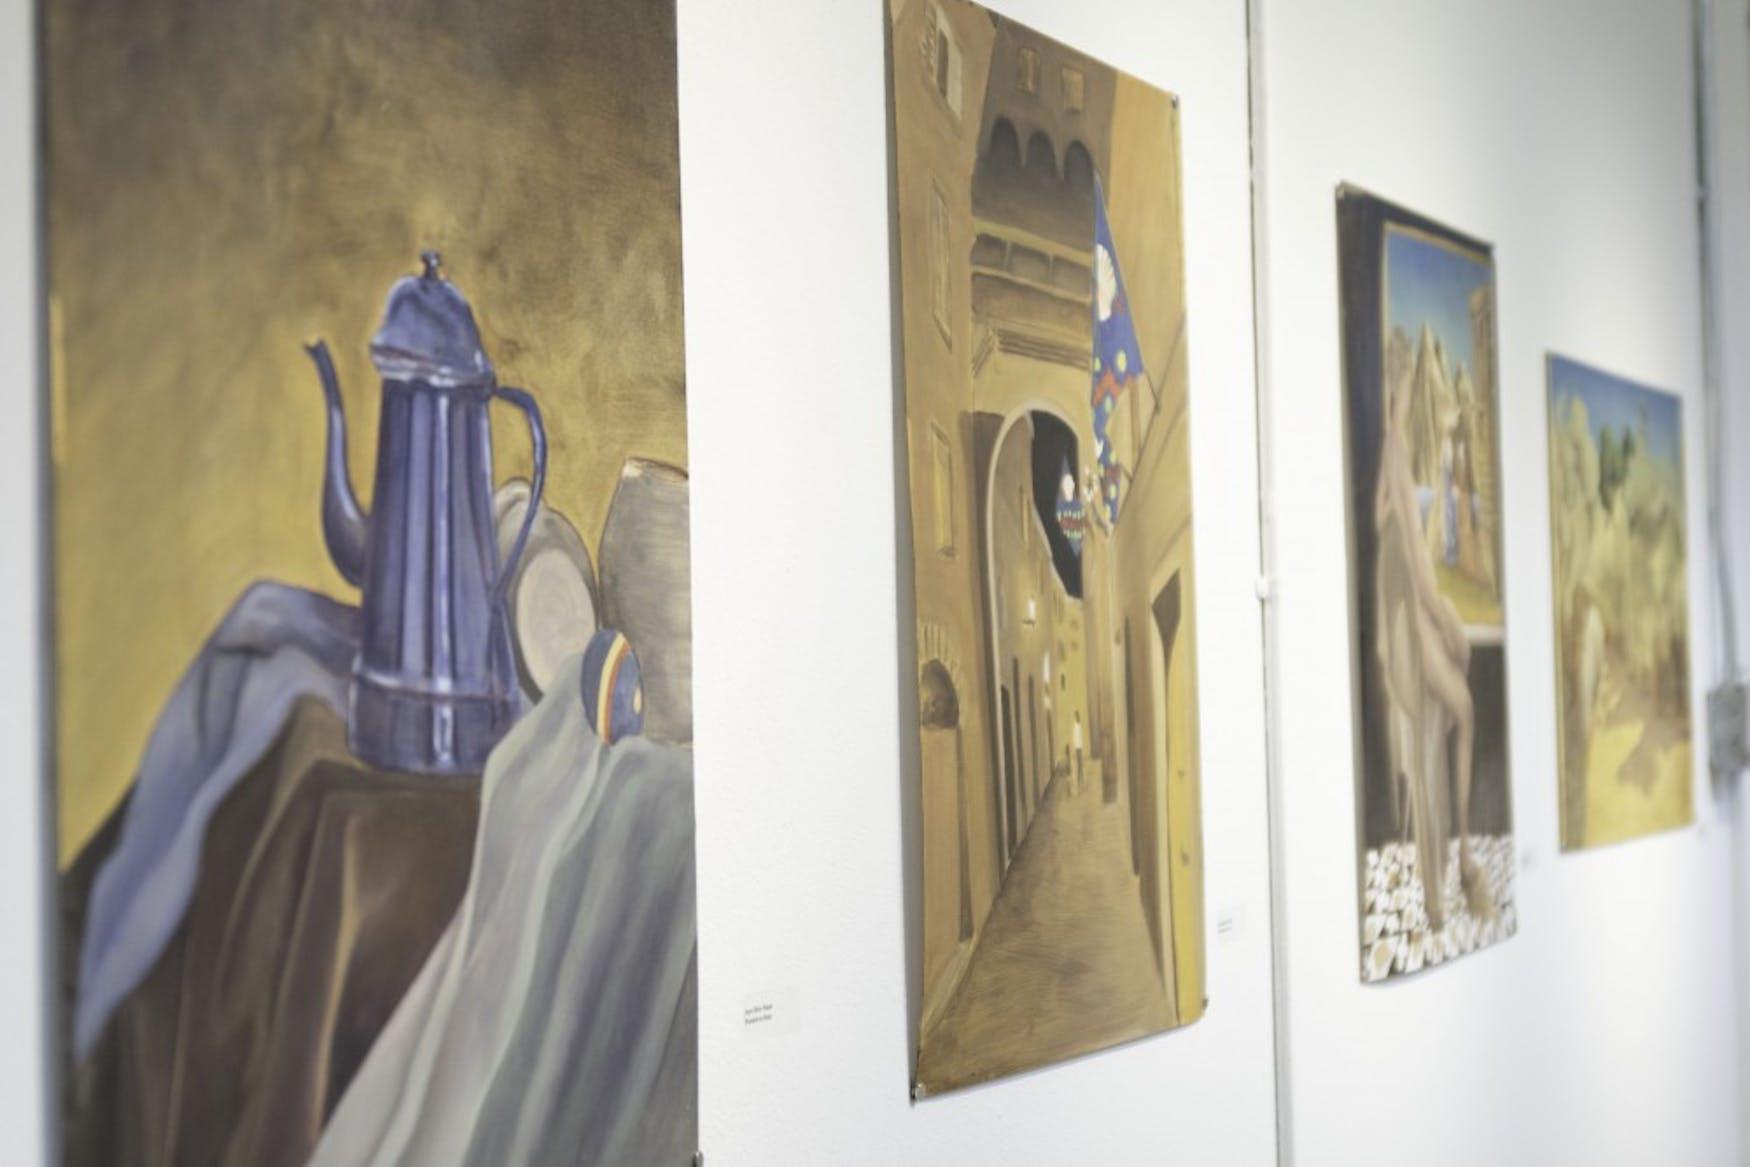 goldman-shwartz-art-show-9-12-19-lb-0027